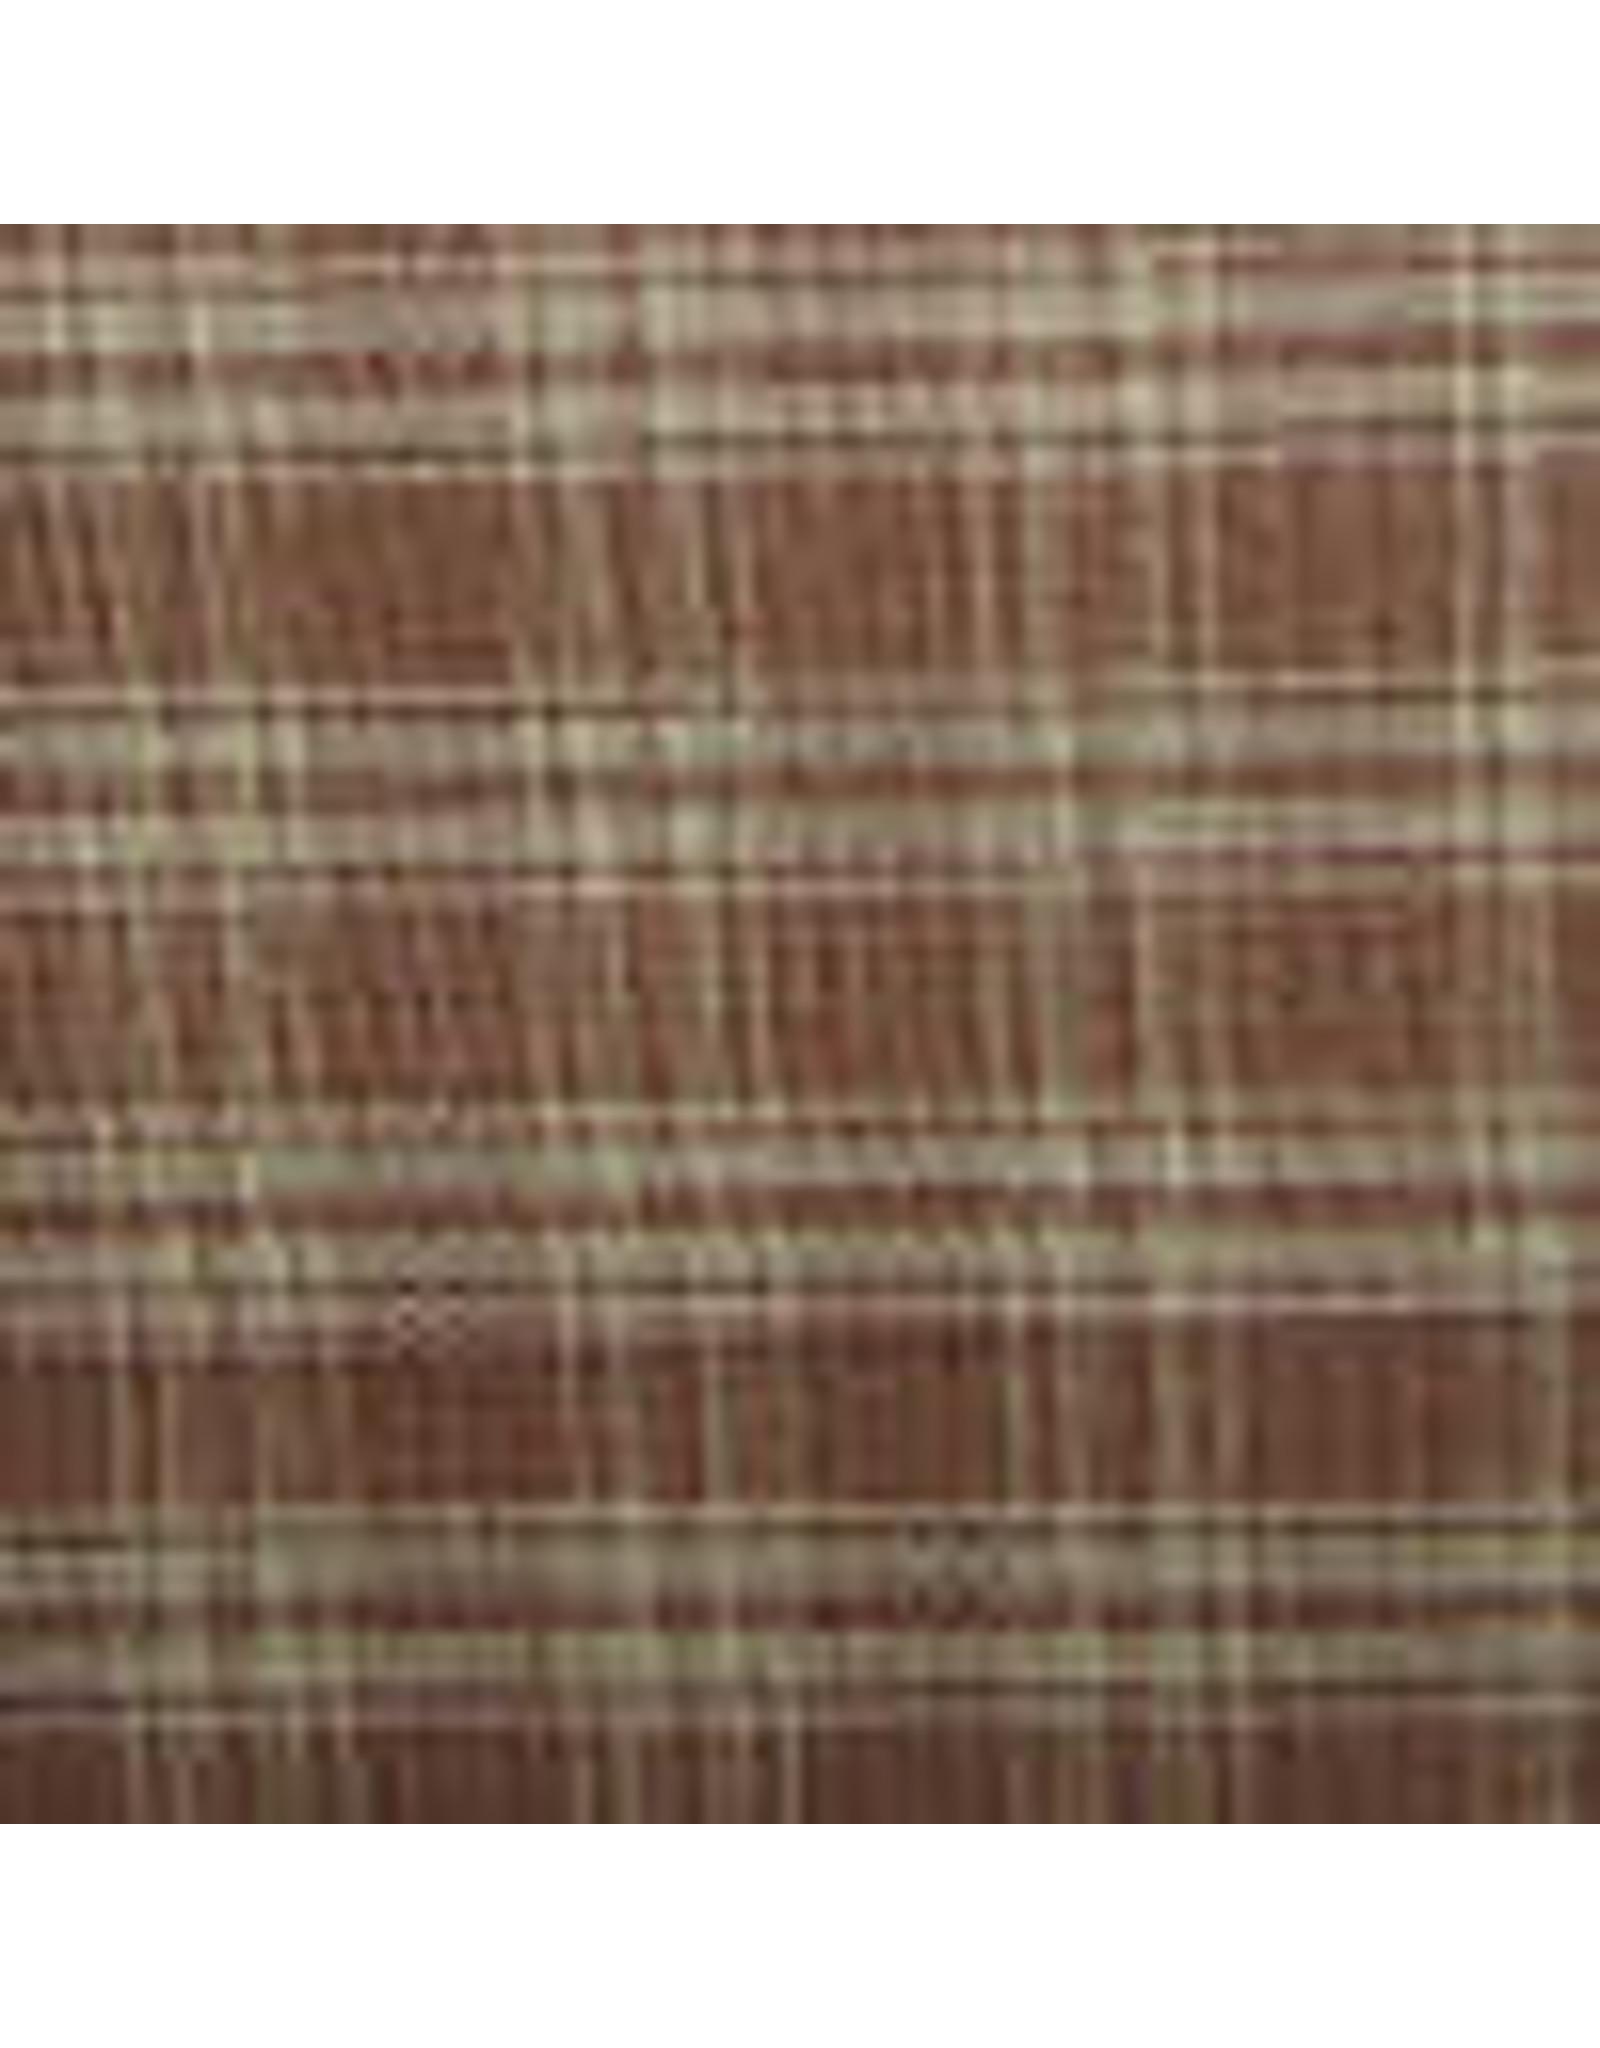 Yd. Brown and Tan Catawba Fabric #91